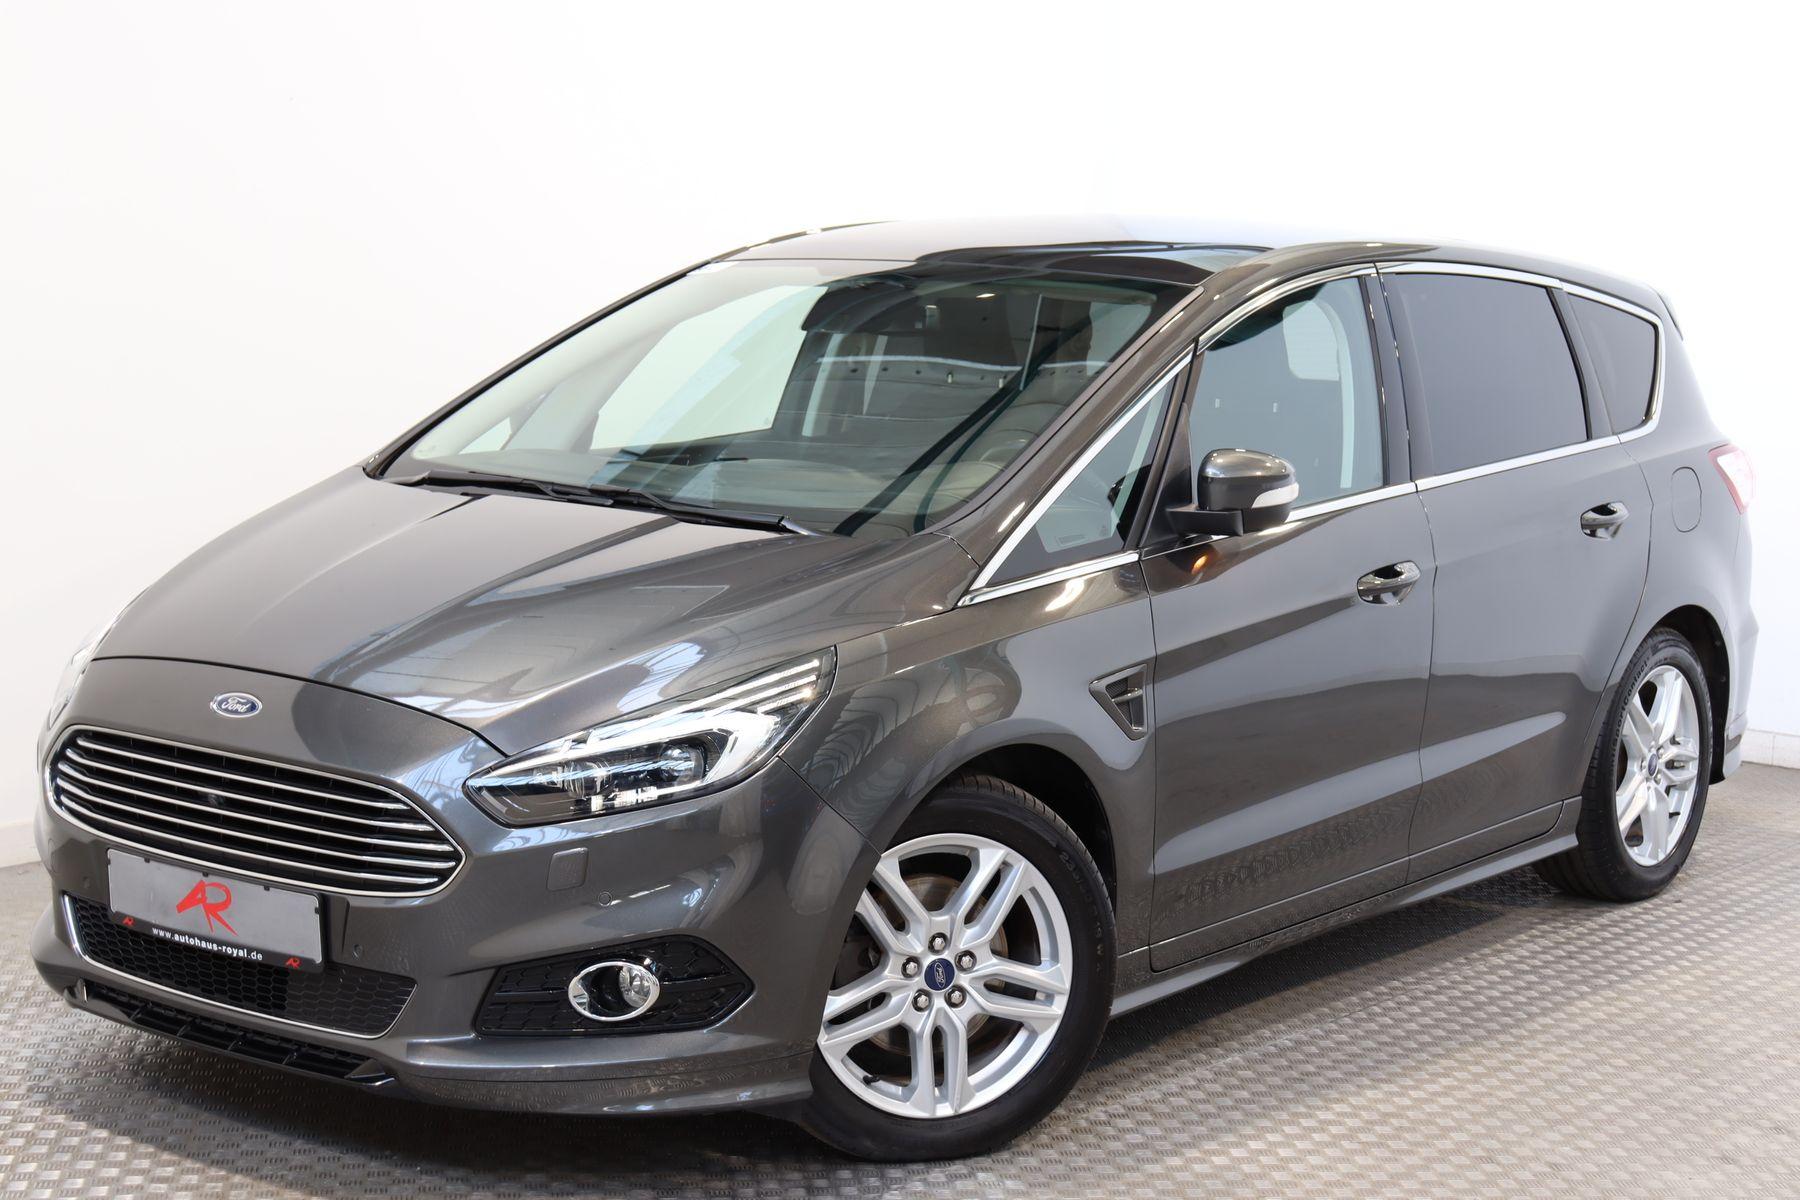 Ford S-Max 2.0 TDCI TITANIUM 7 SITZE PANORAMA,KEYLESS, Jahr 2017, Diesel